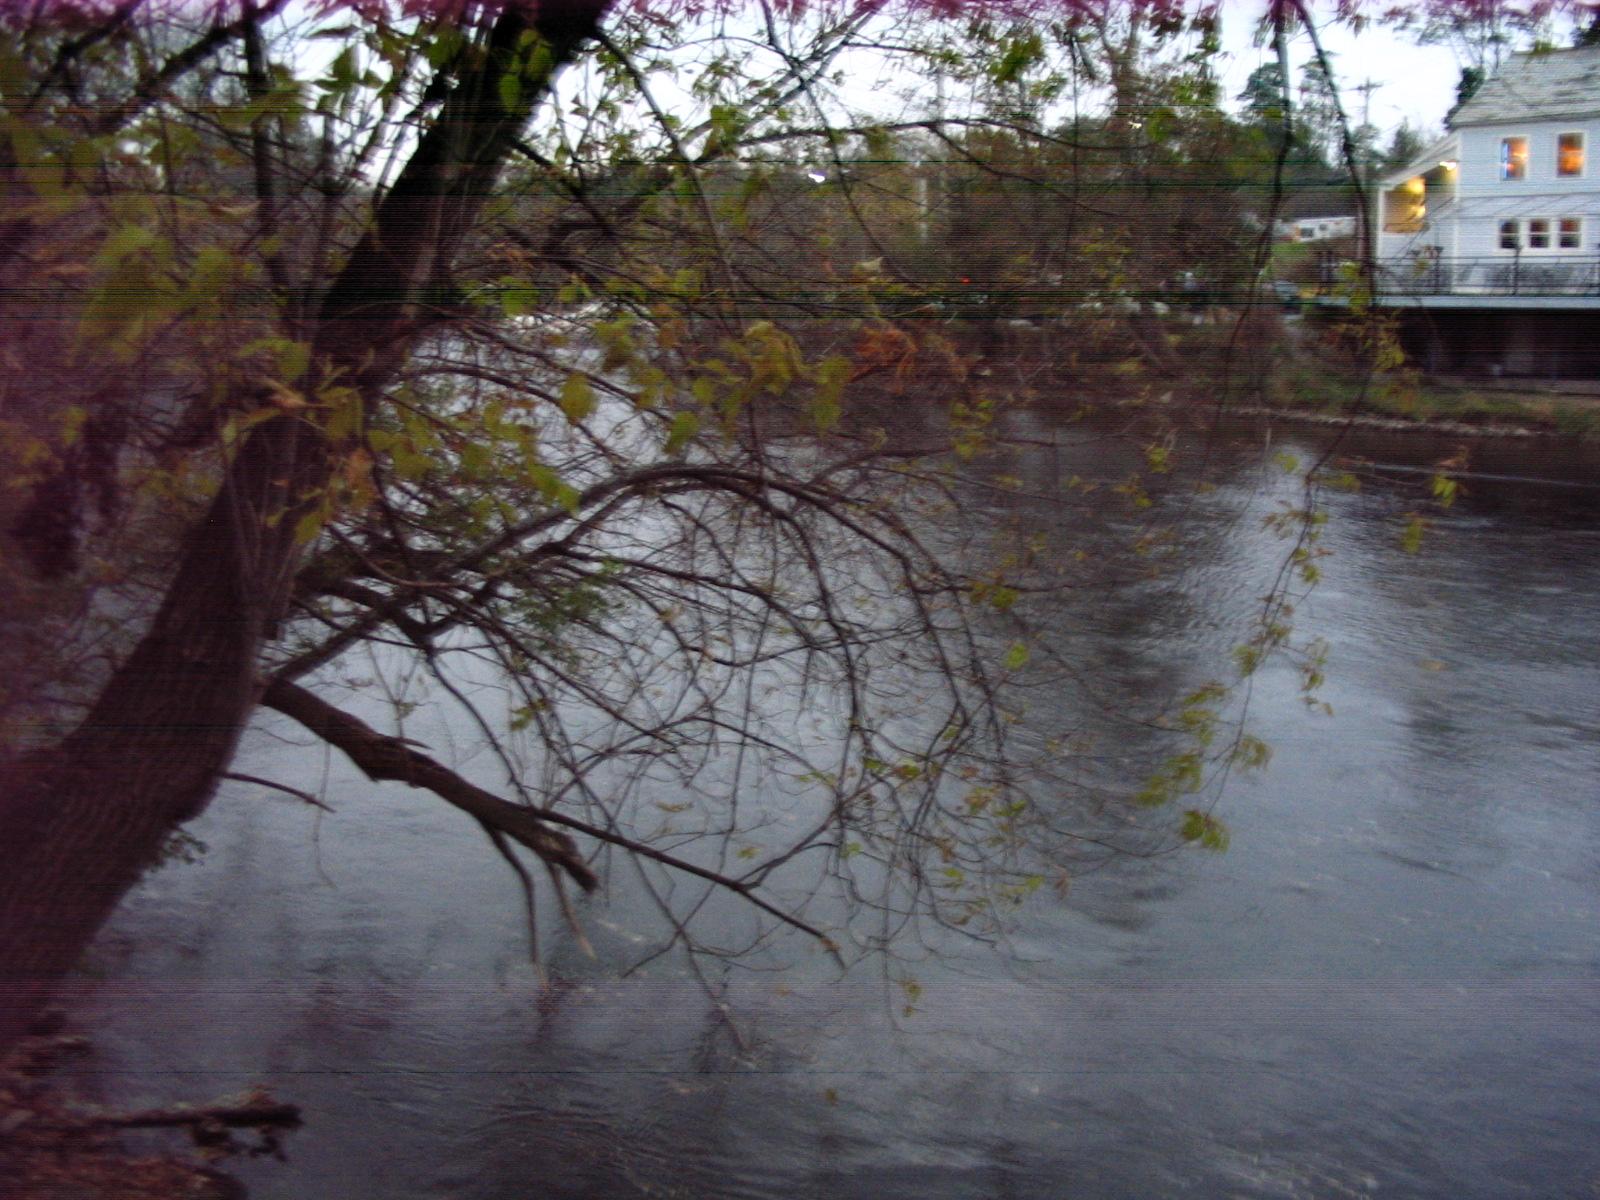 Photograph of the Otter Creek at Middlebury, VT (MDBV1) looking upstream